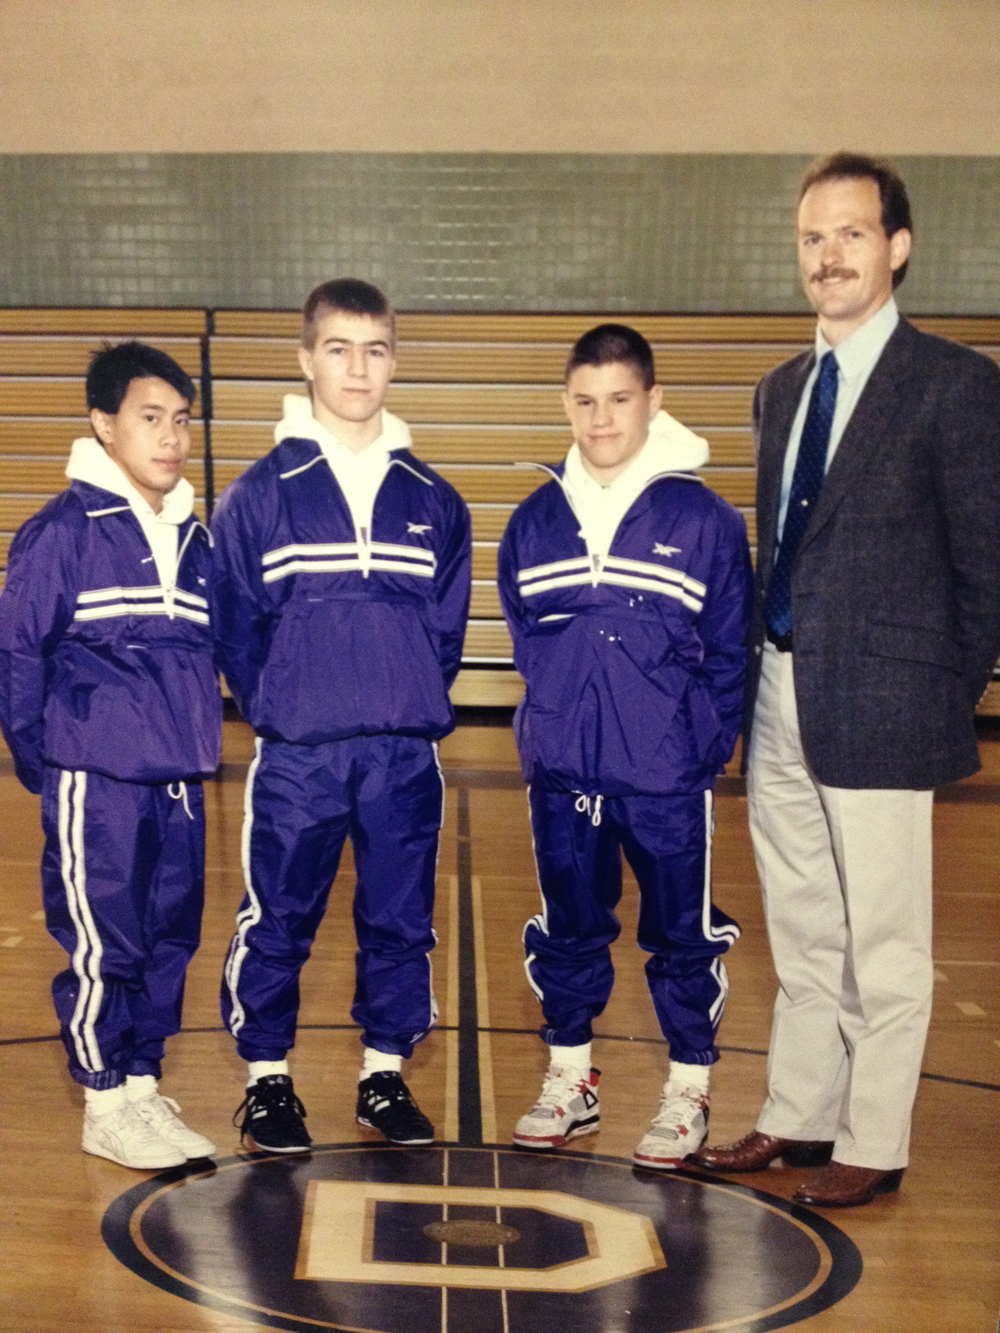 1990 STATE CHAMPIONS  Boys Gymnastics